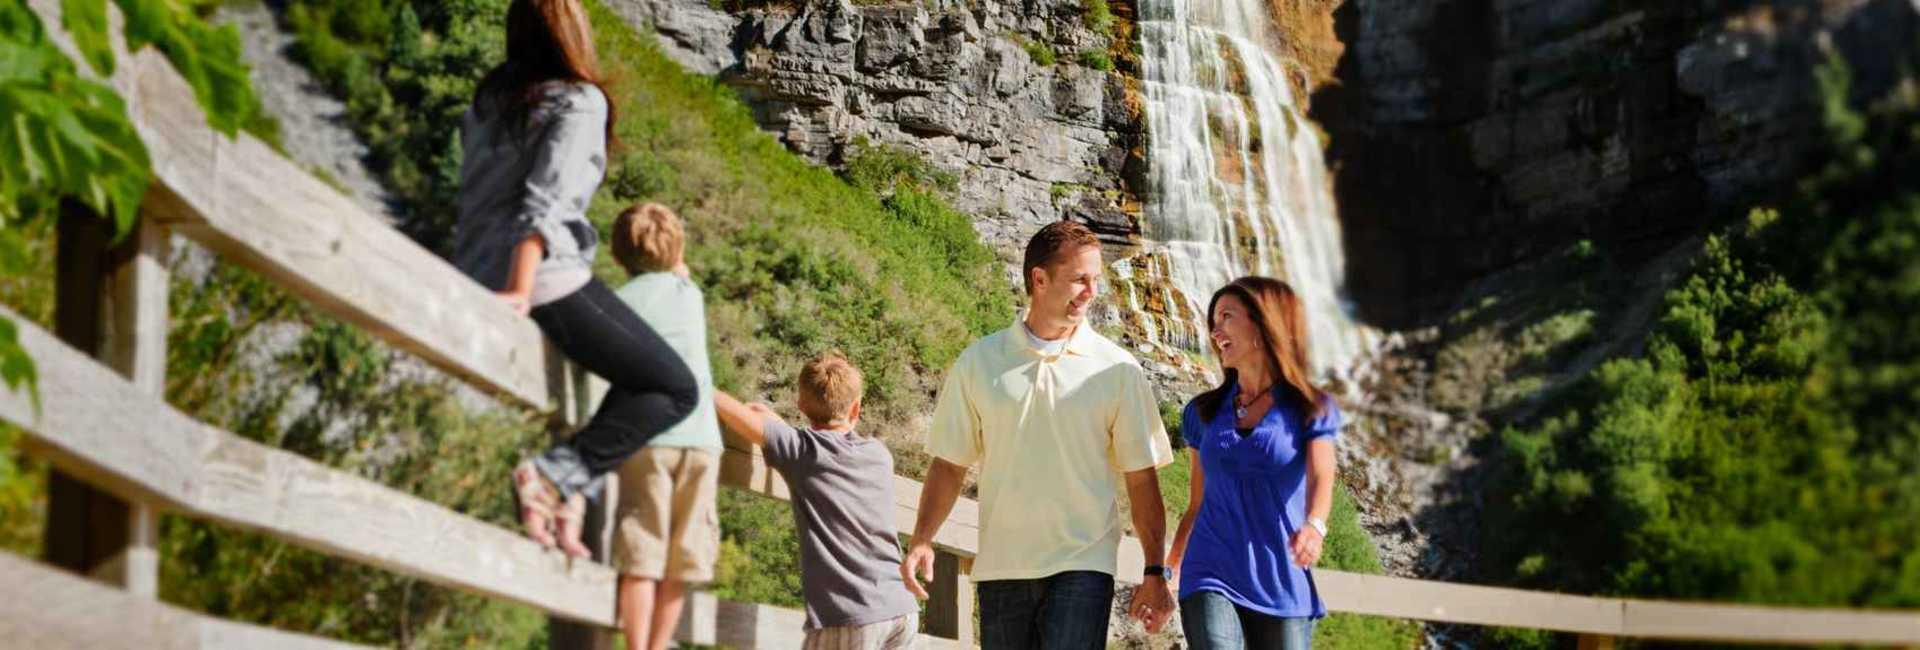 family attractions | explore utah valley